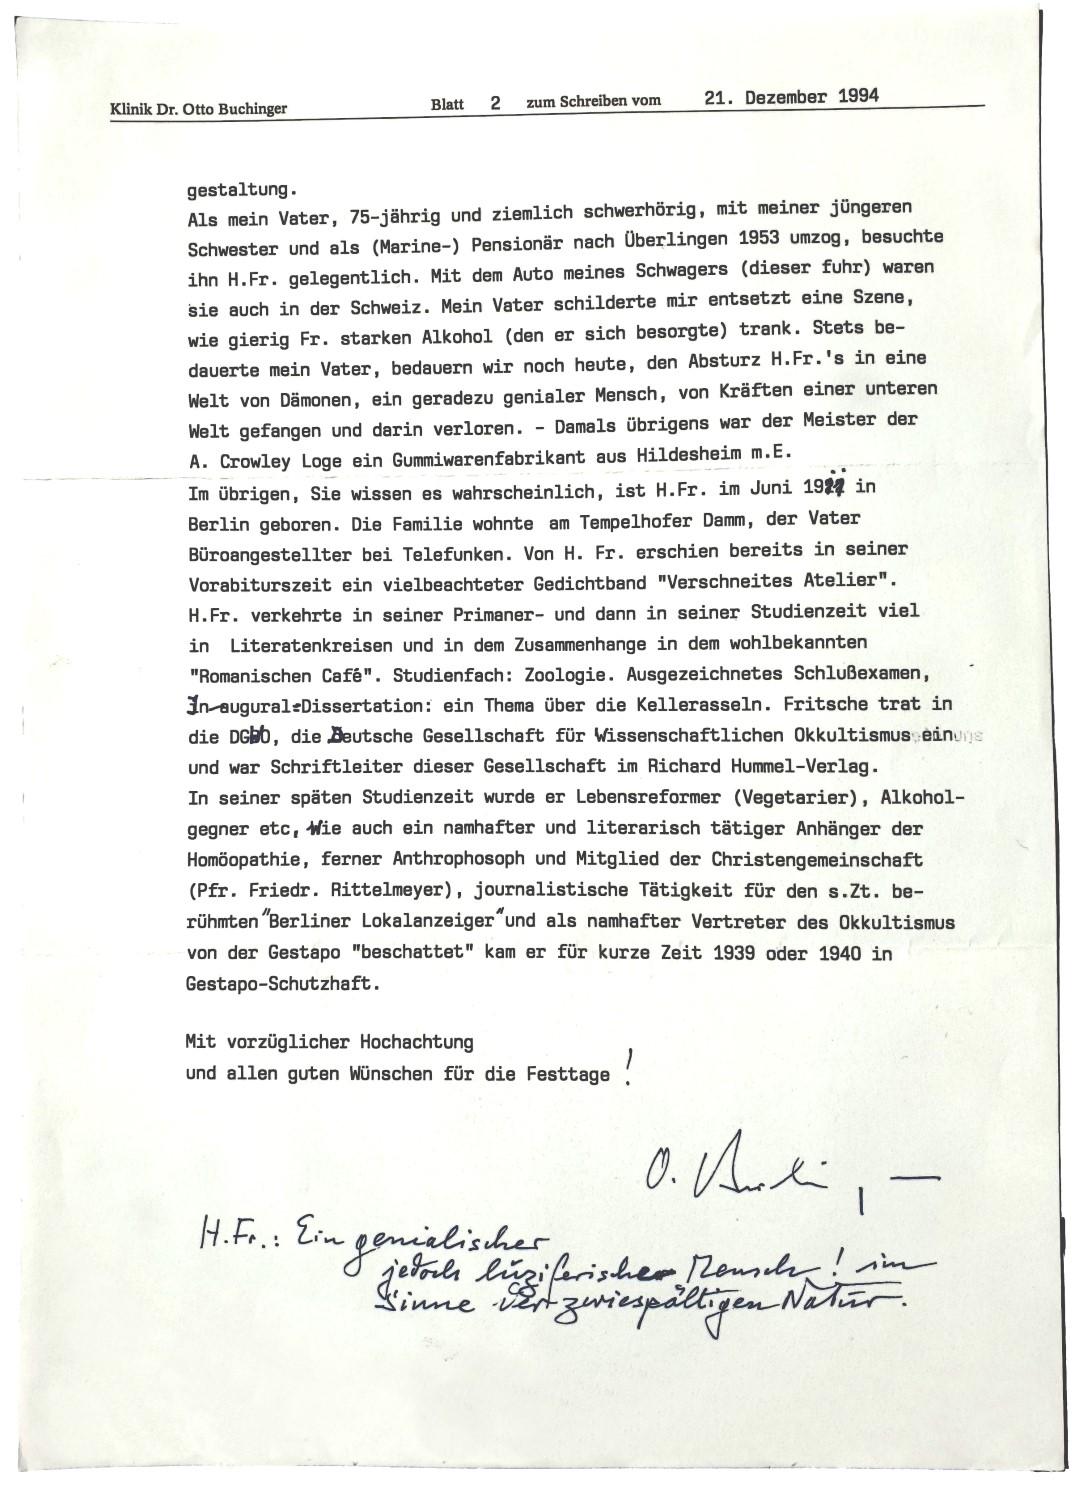 Herbert Fritsche Otto Buchinger Bad Pyrmont